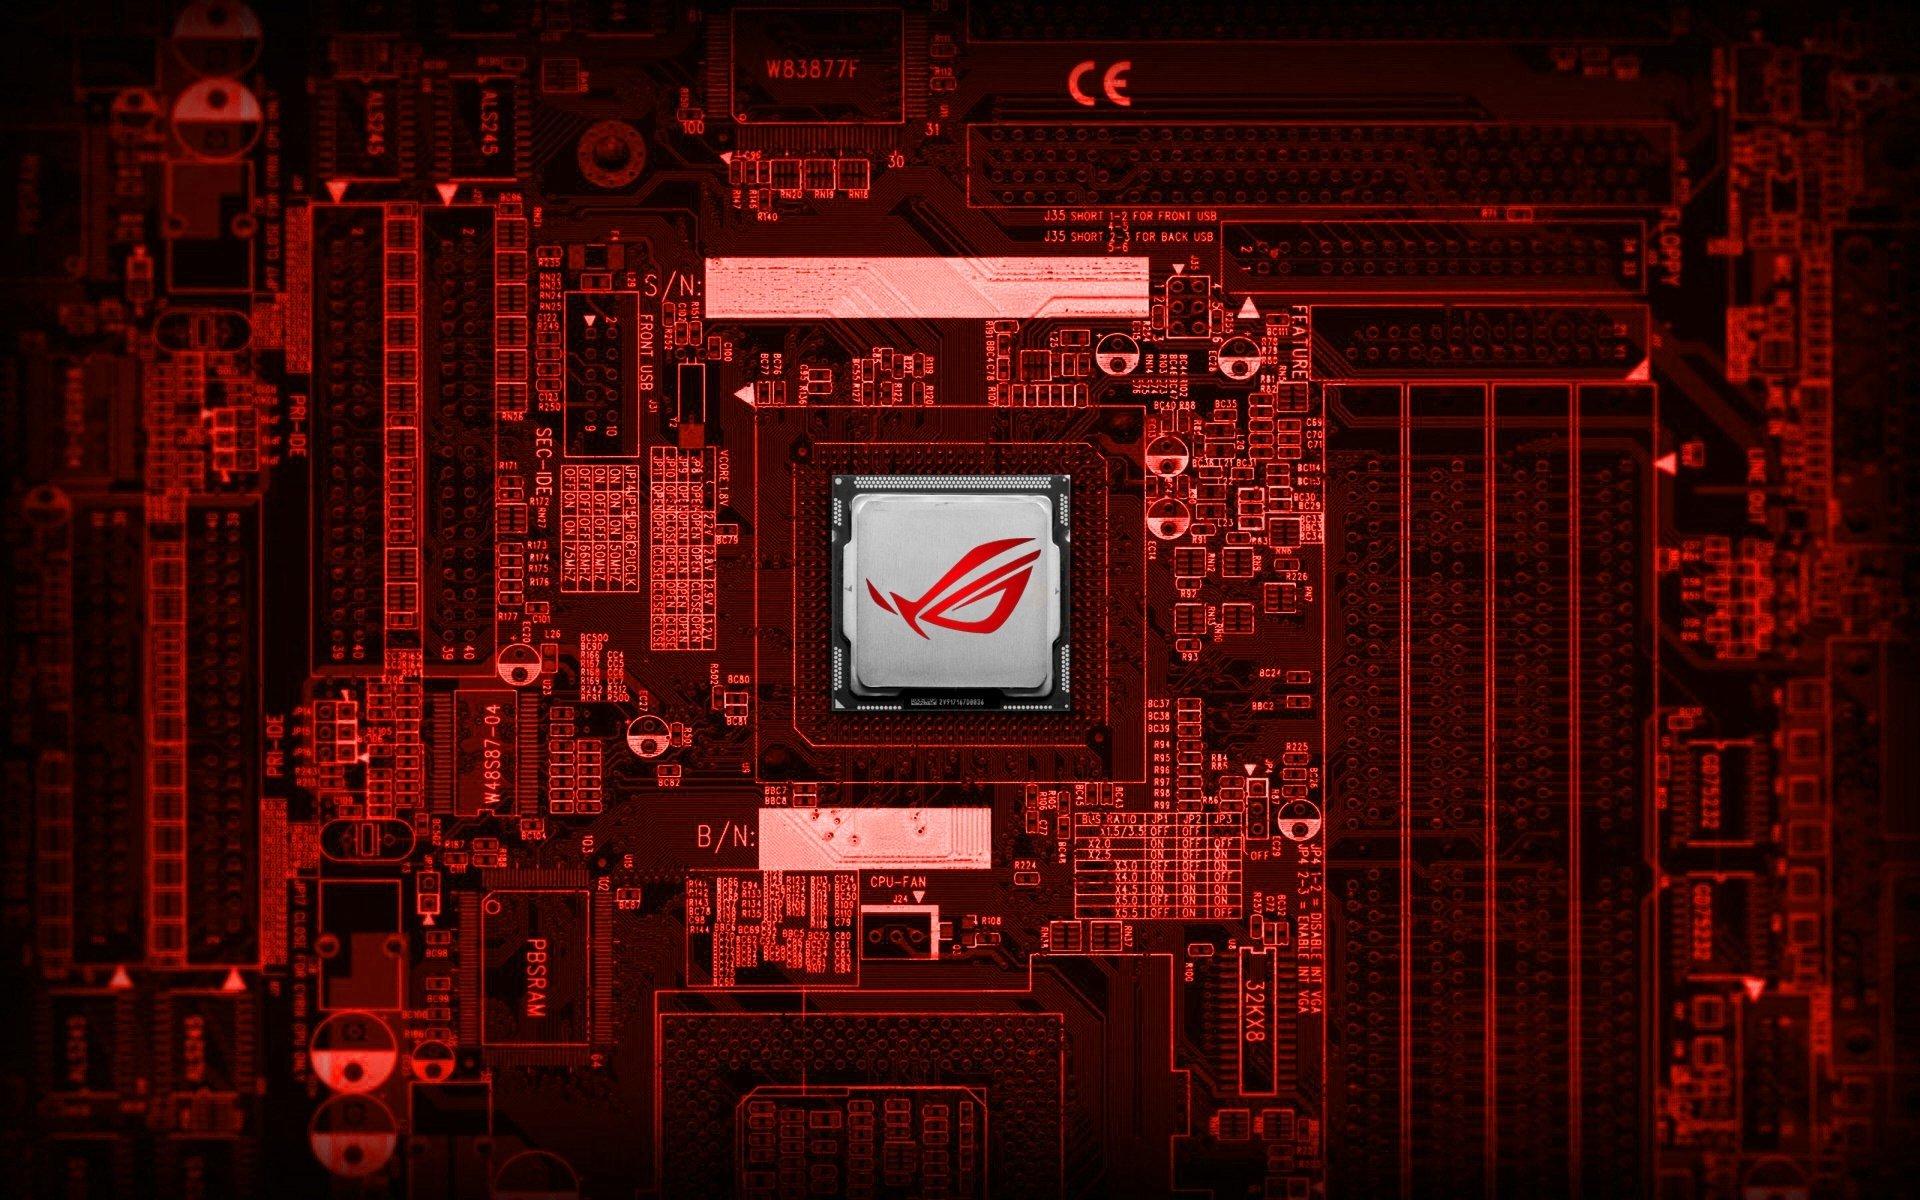 asus red tecnology wallpaper - photo #7